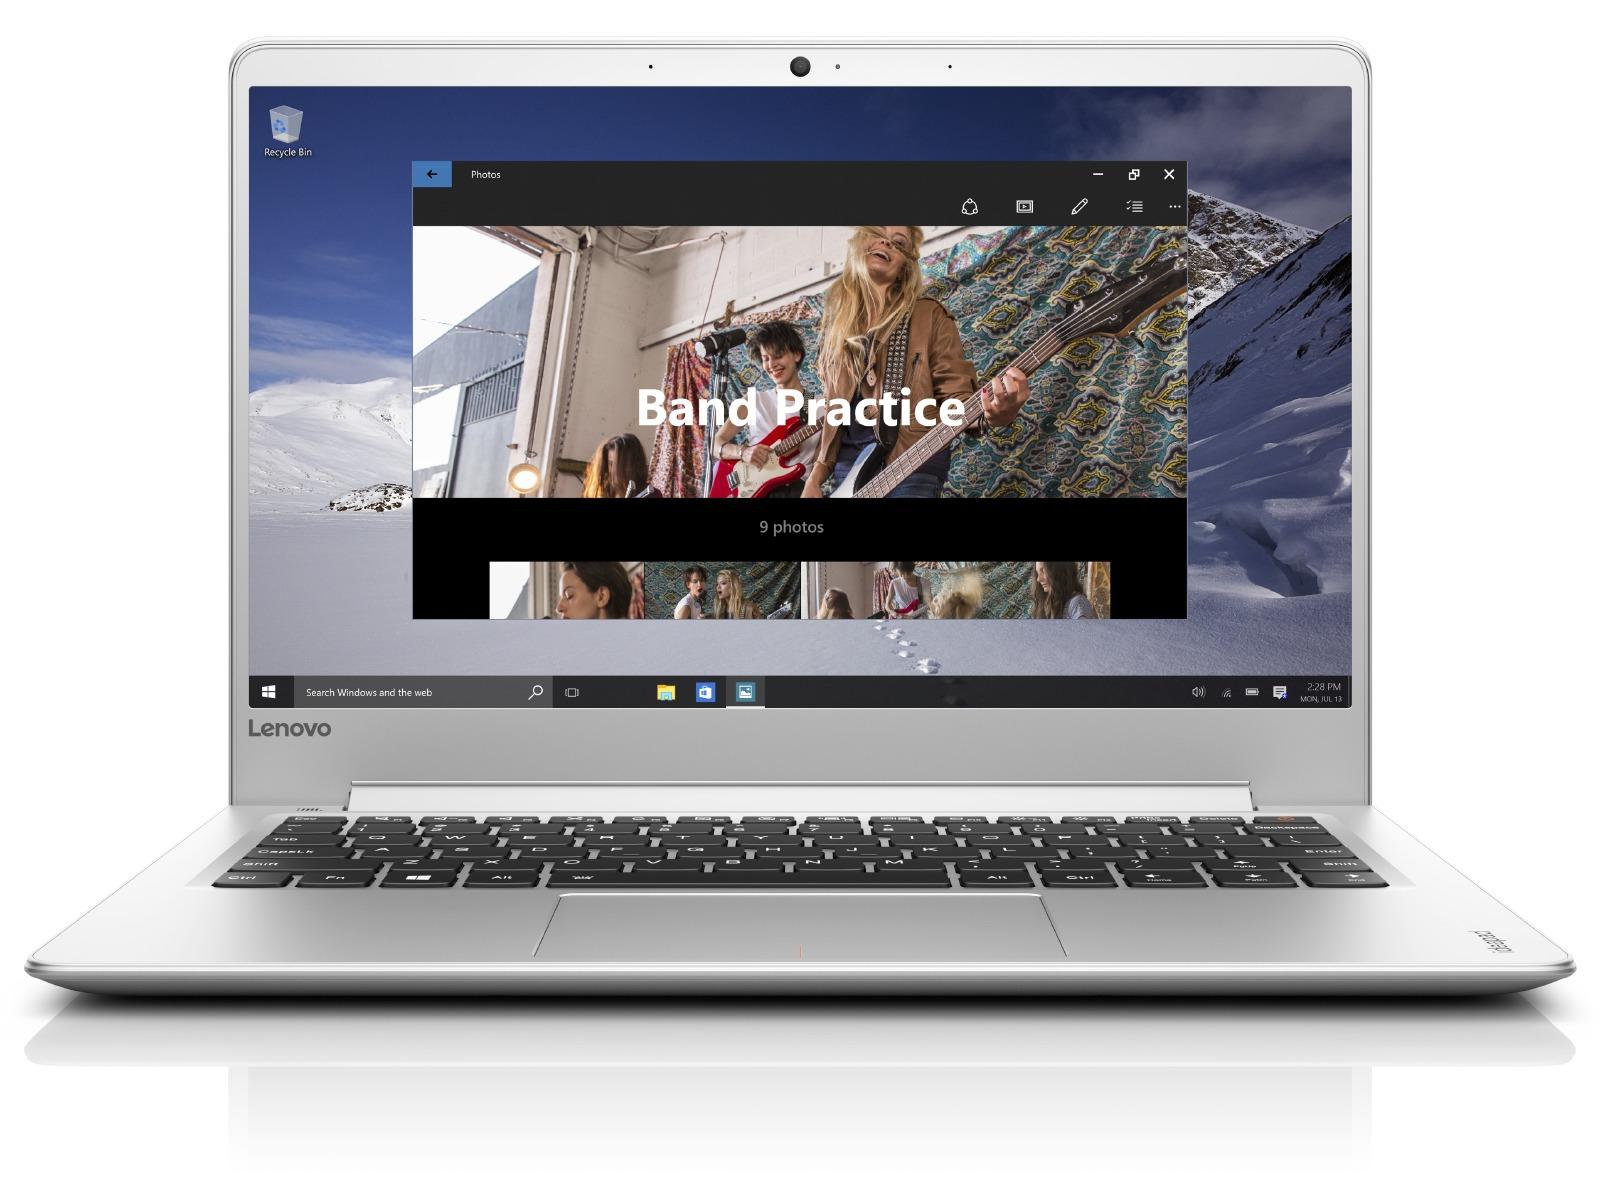 Lenovo IdeaPad 710S 13.3 FHD IPS AG/I5-7200U/256G SSD/8G/INT/W10 stříbrný